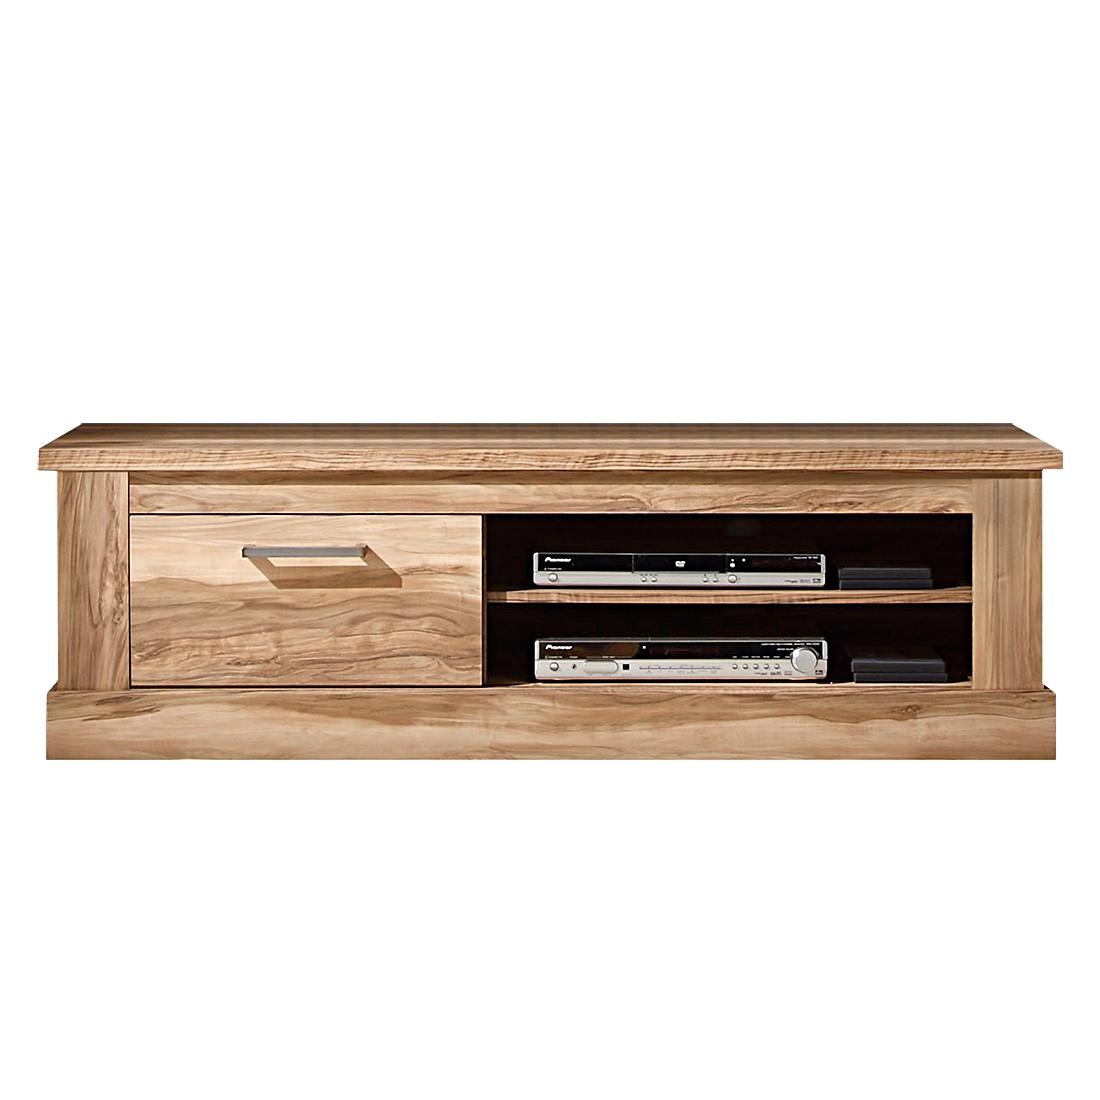 tv lowboard nussbaum preis vergleich 2016. Black Bedroom Furniture Sets. Home Design Ideas